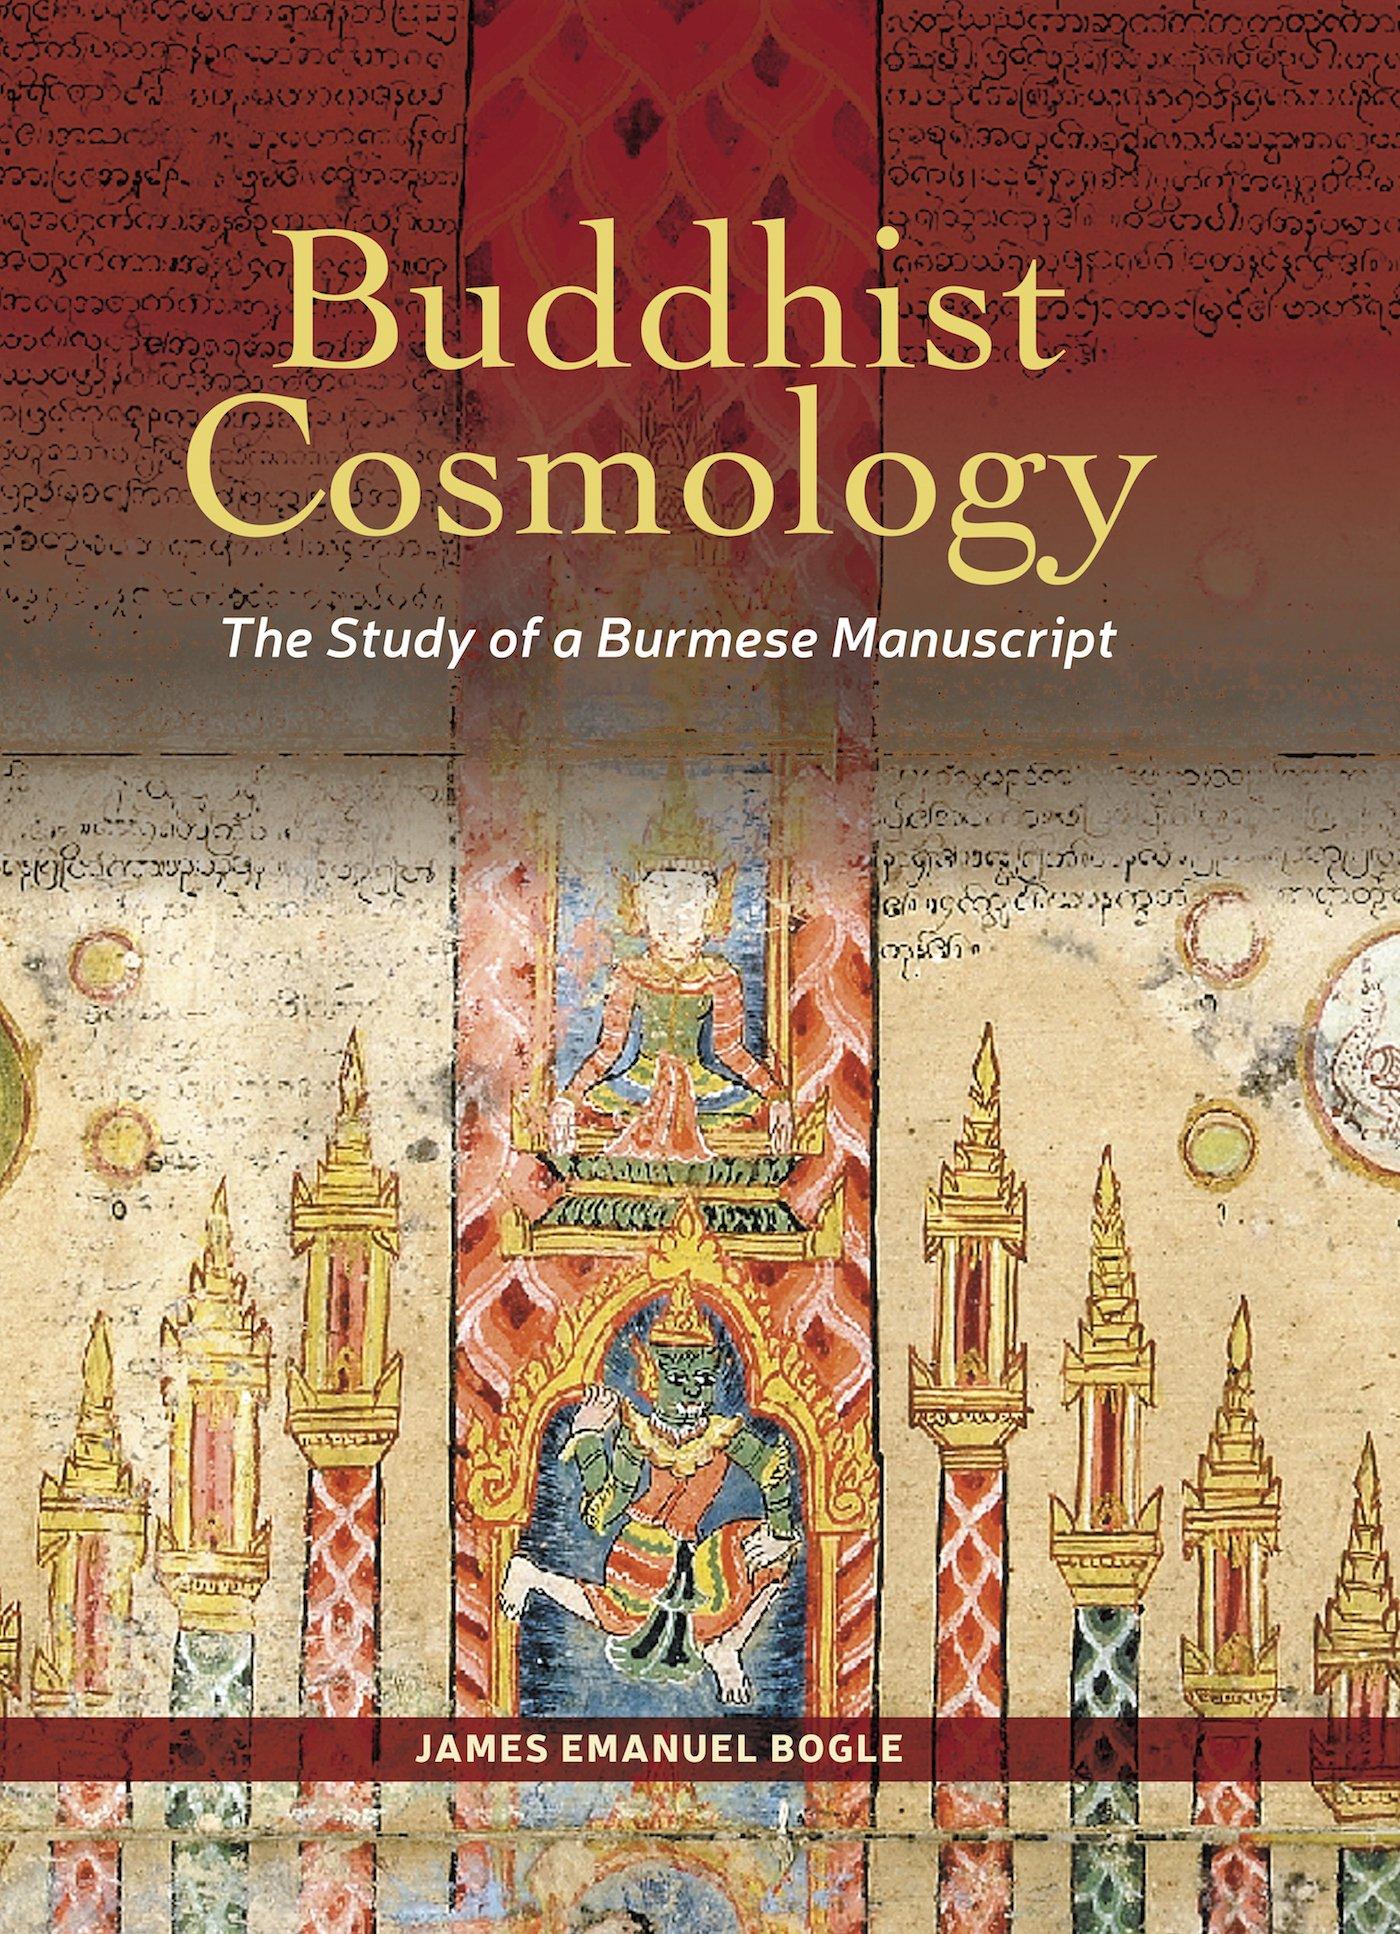 Buddhist Cosmology: The Study of a Burmese Manuscript pdf epub